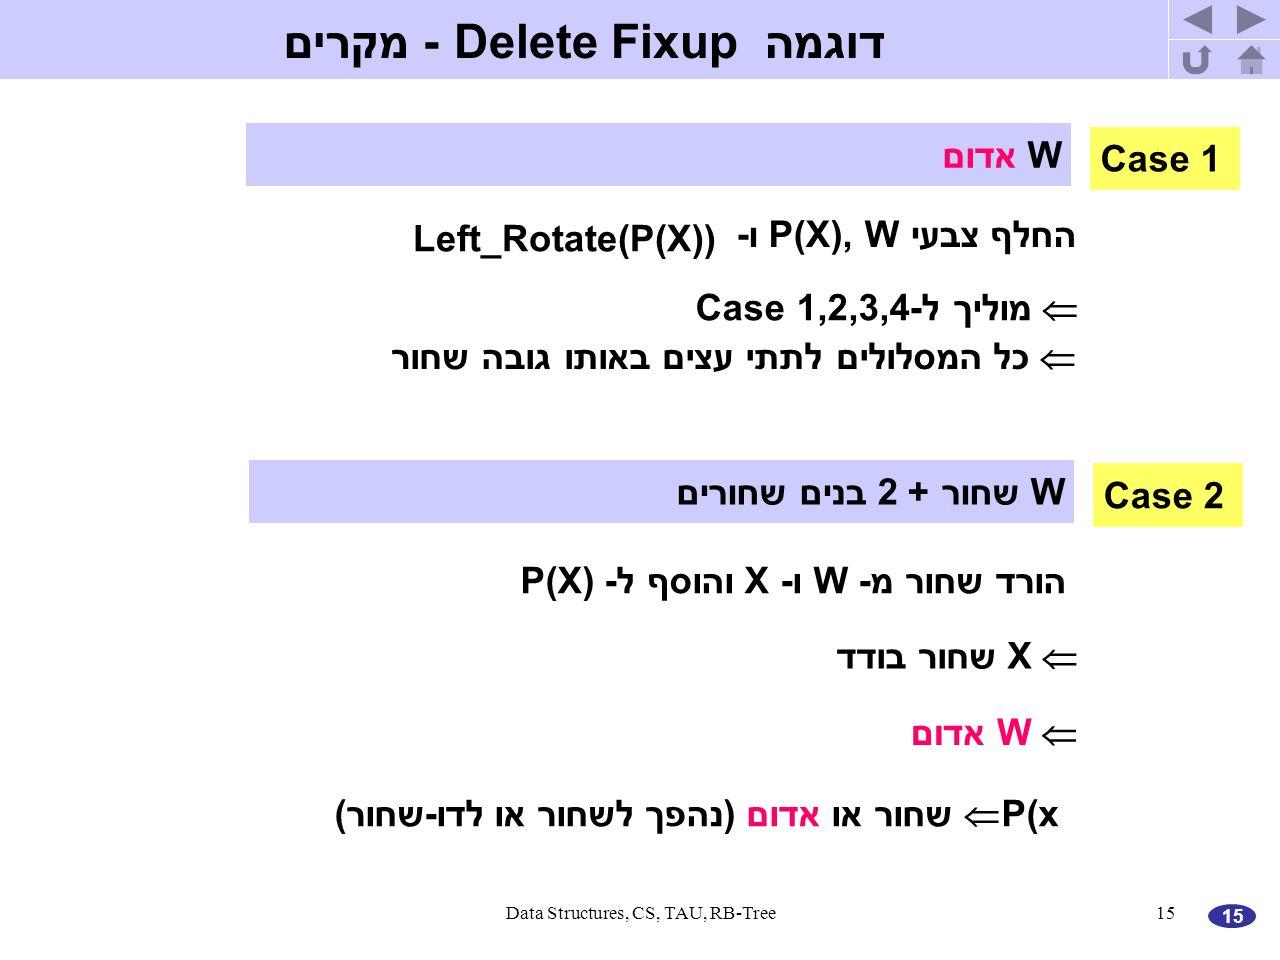 15 Data Structures, CS, TAU, RB-Tree15 דוגמה Delete Fixup - מקרים הורד שחור מ- W ו- X והוסף ל- P(X)  X שחור בודד  W אדום  P(x שחור או אדום (נהפך לשחור או לדו-שחור) החלף צבעי P(X), W ו- Left_Rotate(P(X))  מוליך ל-Case 1,2,3,4  כל המסלולים לתתי עצים באותו גובה שחור Case 1 W אדום Case 2 W שחור + 2 בנים שחורים